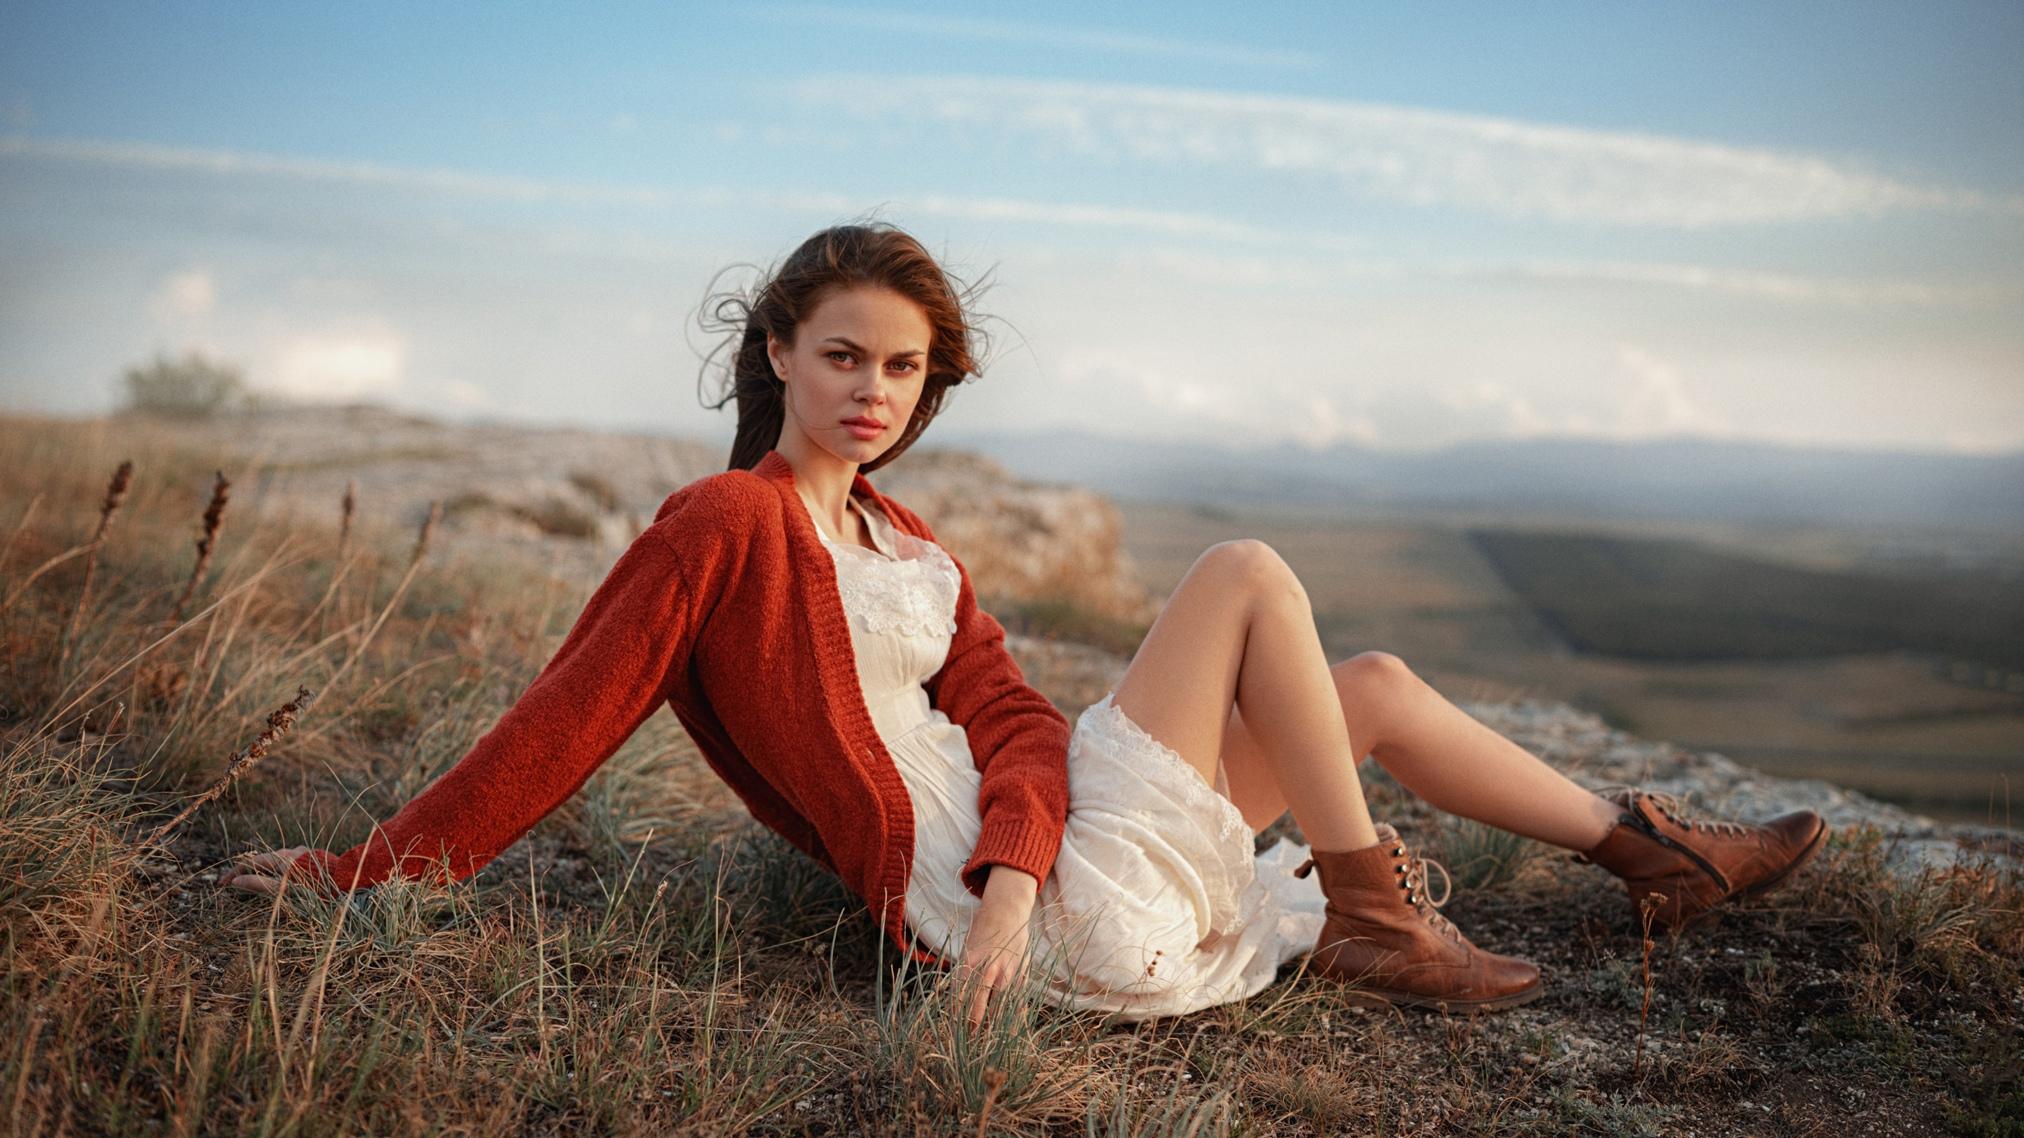 People 2024x1138 Georgy Chernyadyev women outdoors looking at viewer women outdoors boots sitting legs dress white dress brunette cardigan